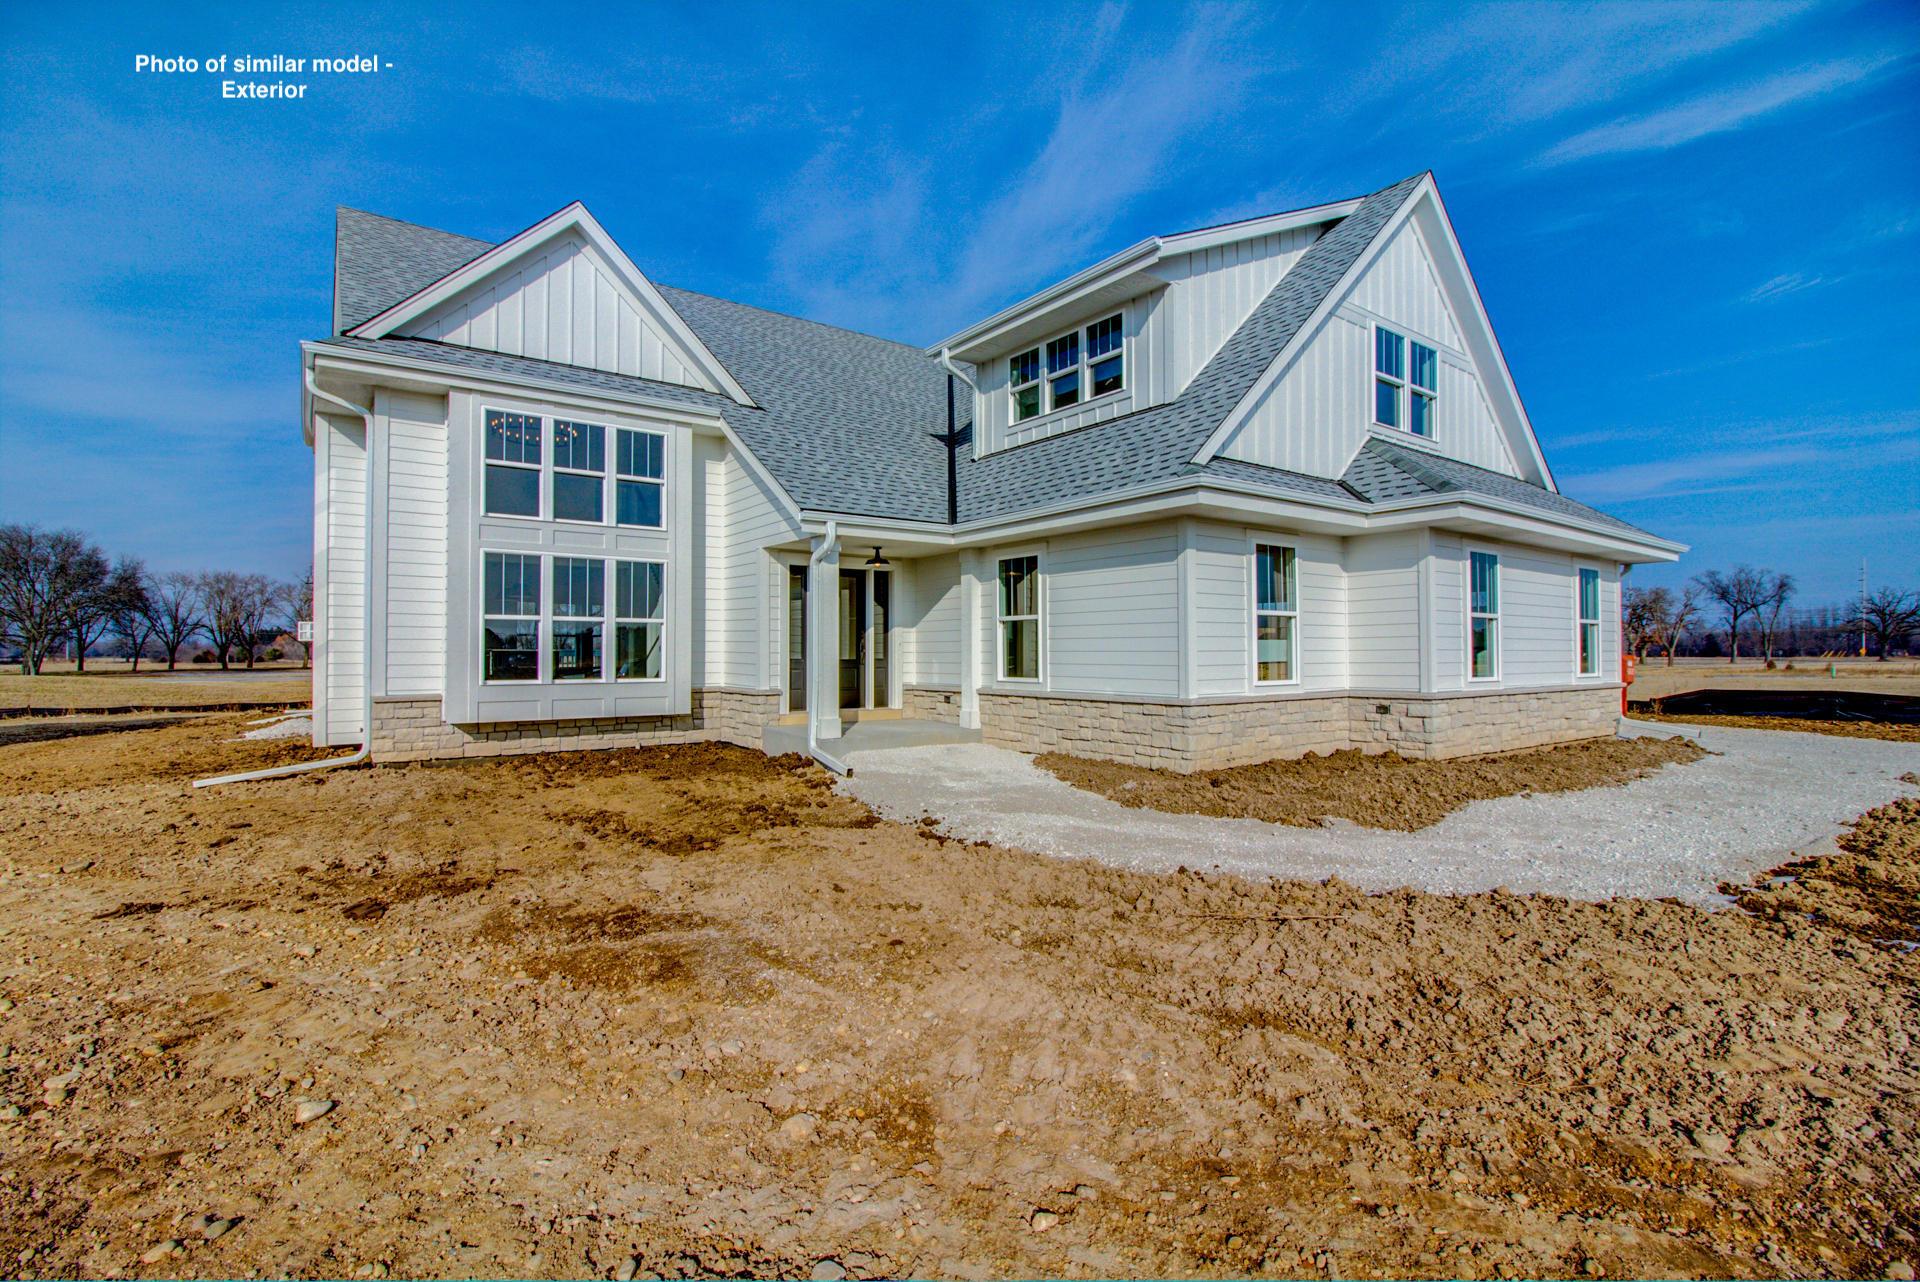 Brilliant N67W13238 West View Cir Menomonee Falls Wi Mls 1645196 Download Free Architecture Designs Sospemadebymaigaardcom